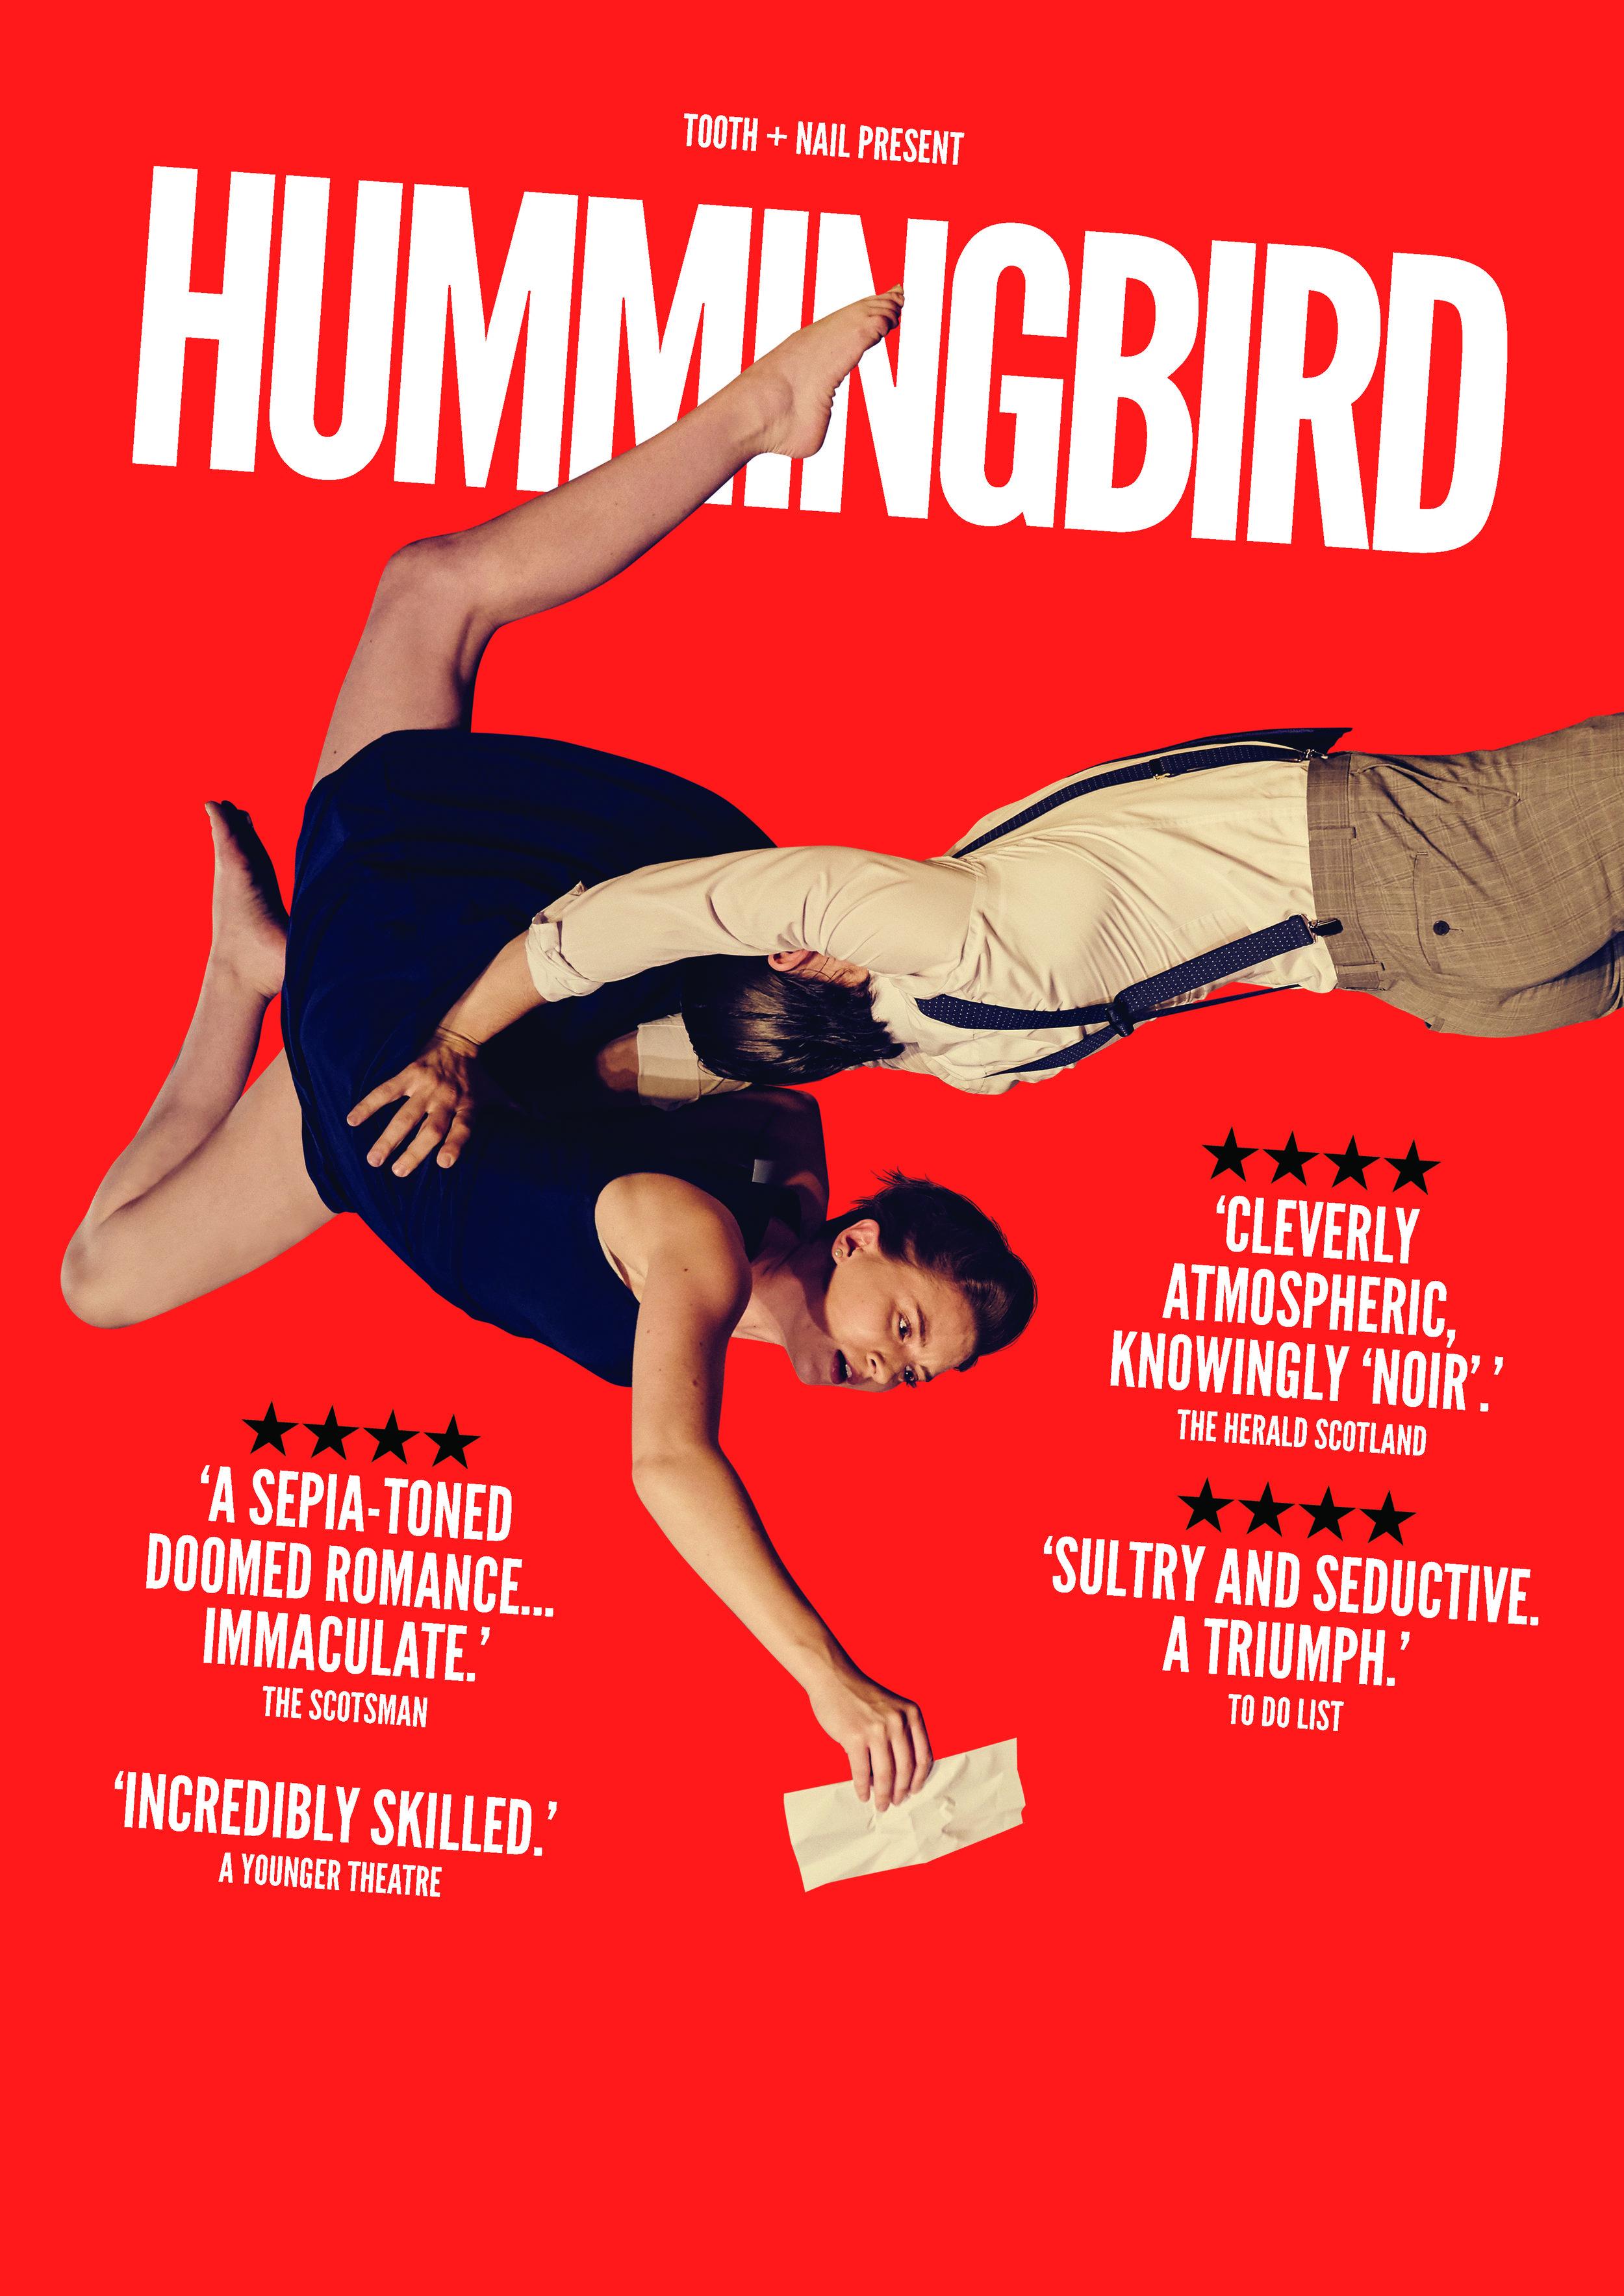 HummingbirdAlpha1 copy.jpg